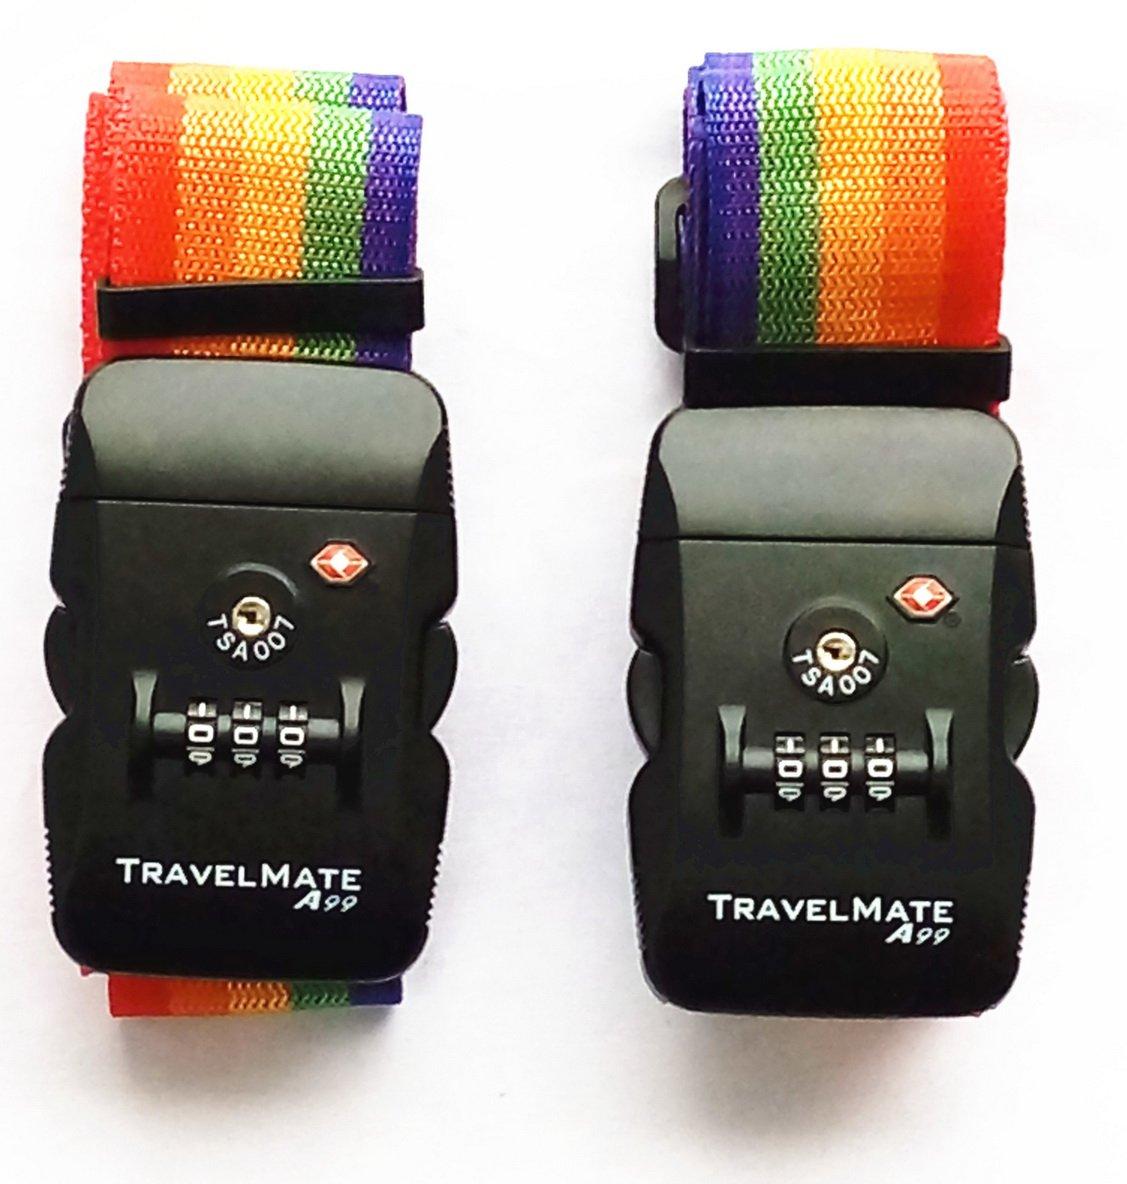 2pcs A99 TSA Travel Mate Strap Luggage Digital Dial Combination Safe Suitcase Lock Strap (Black) A99 Mall